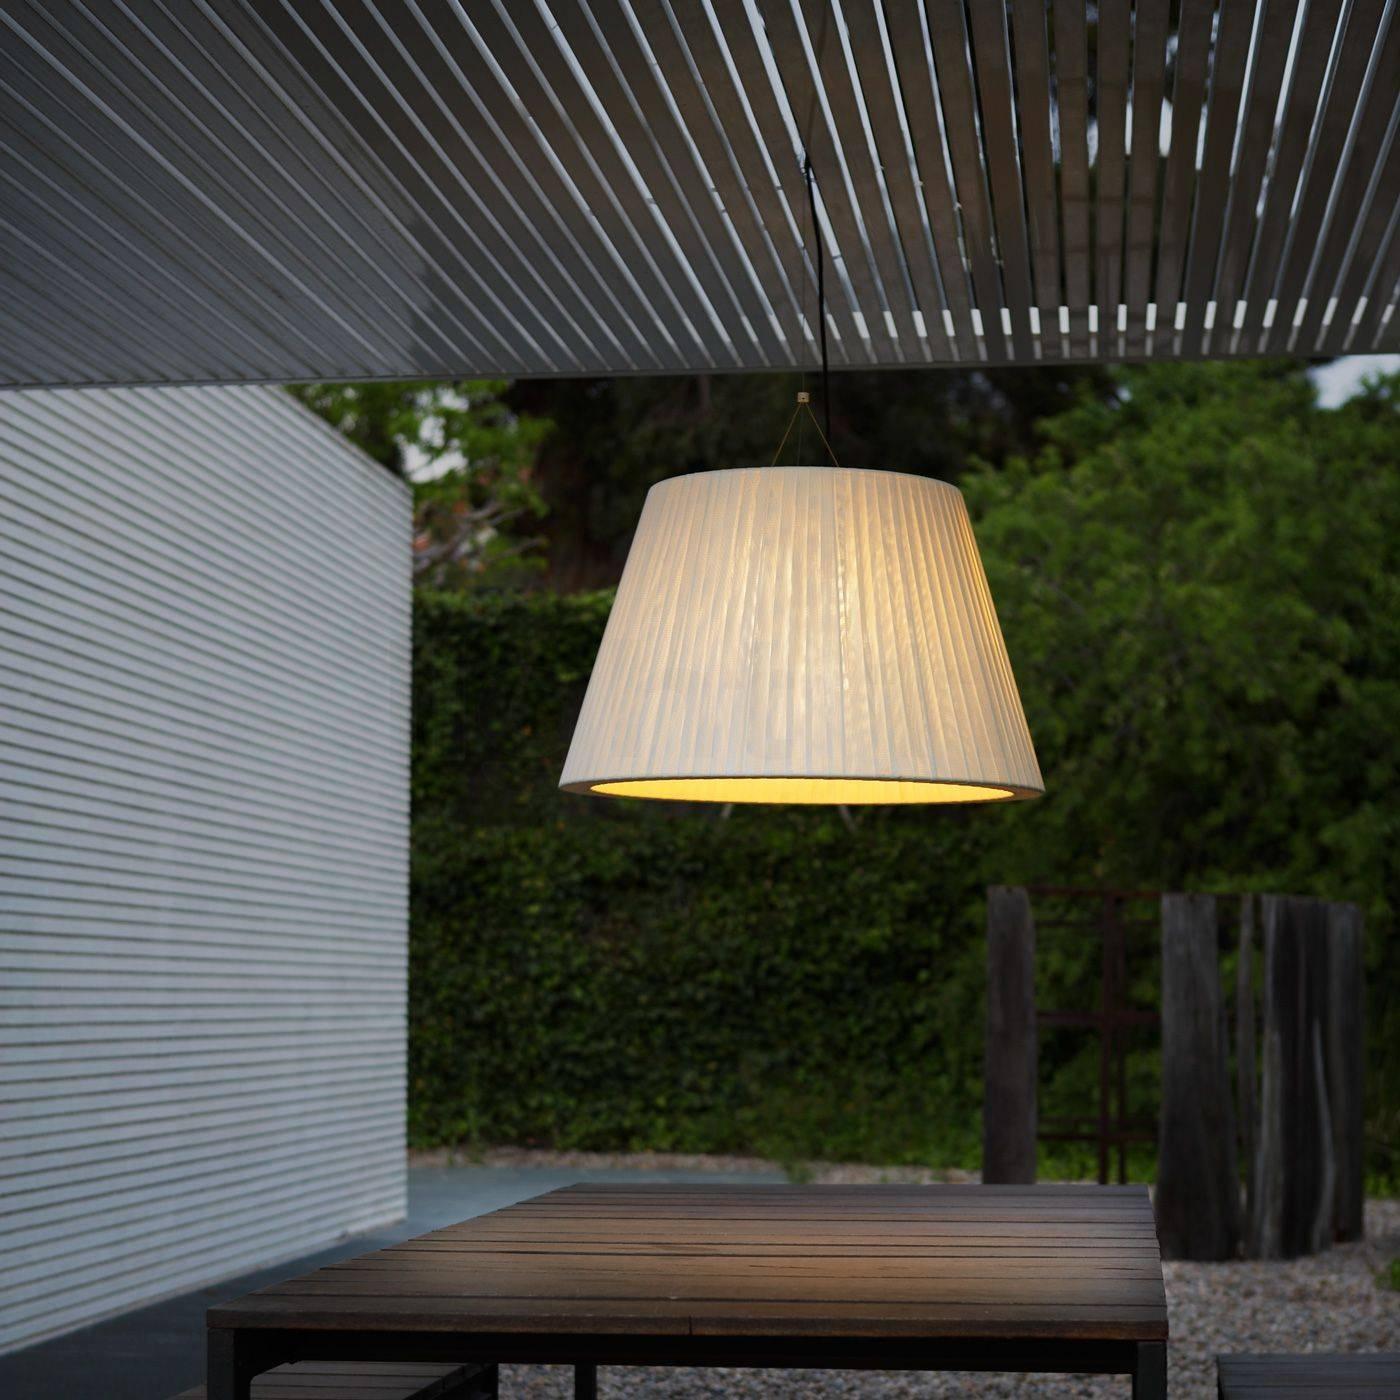 Marset Txl Outdoor Pendant Light Pendant Lights - Light11.eu within Outside Pendant Lights (Image 5 of 15)